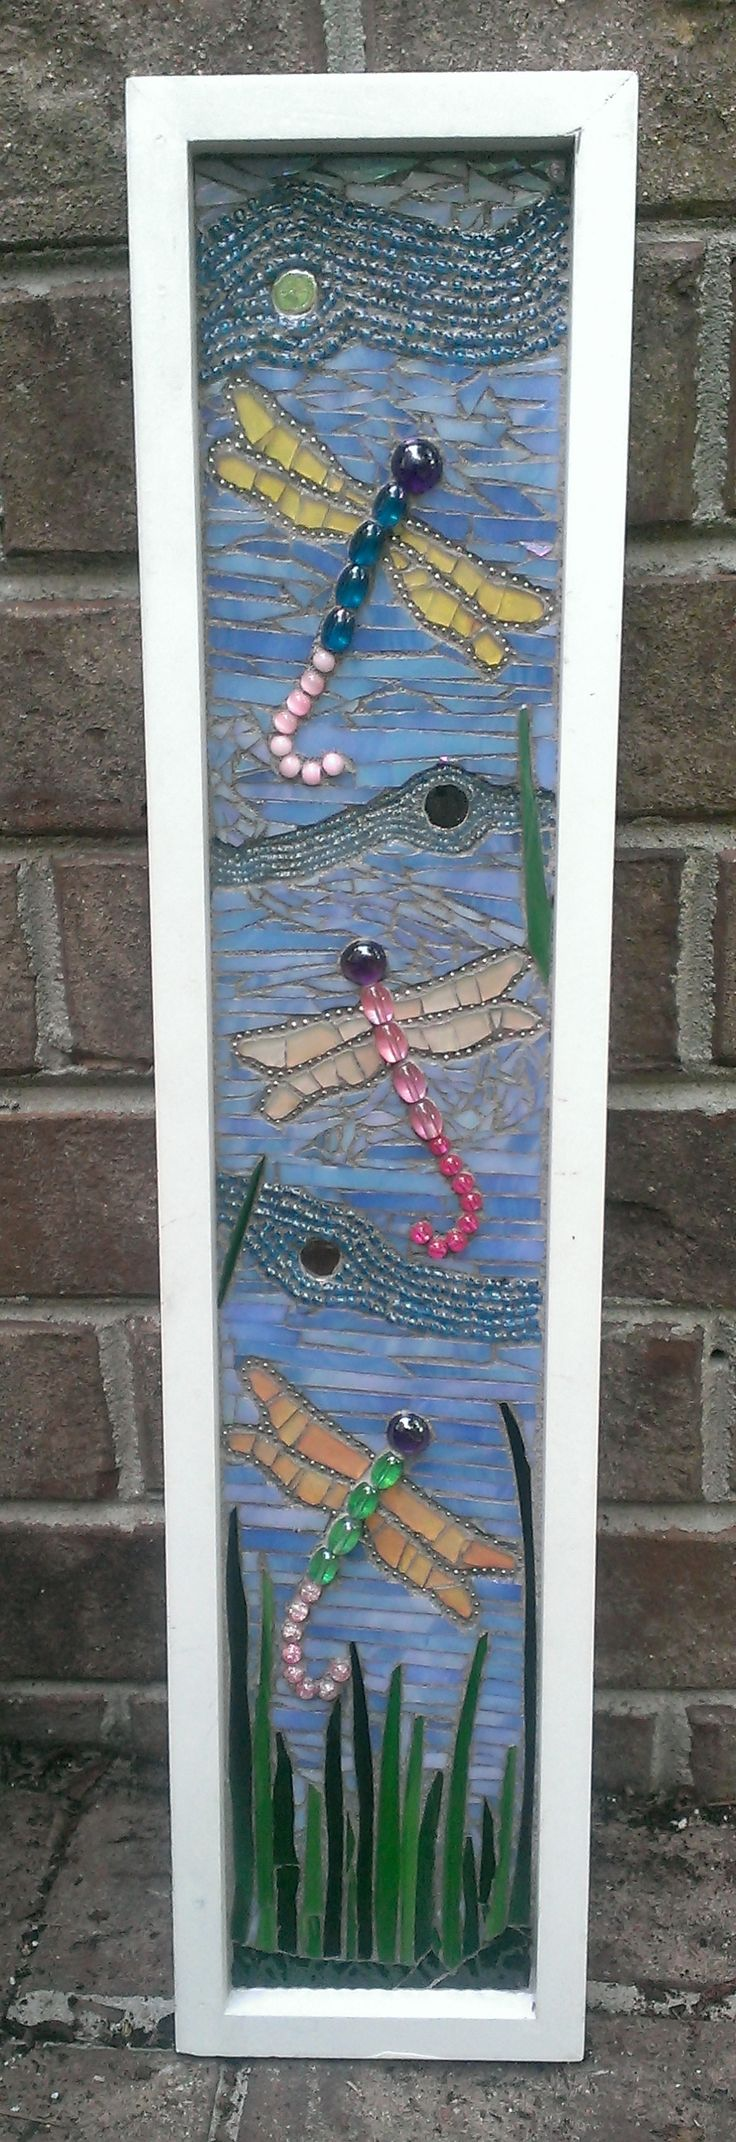 Dragonflies mosaic